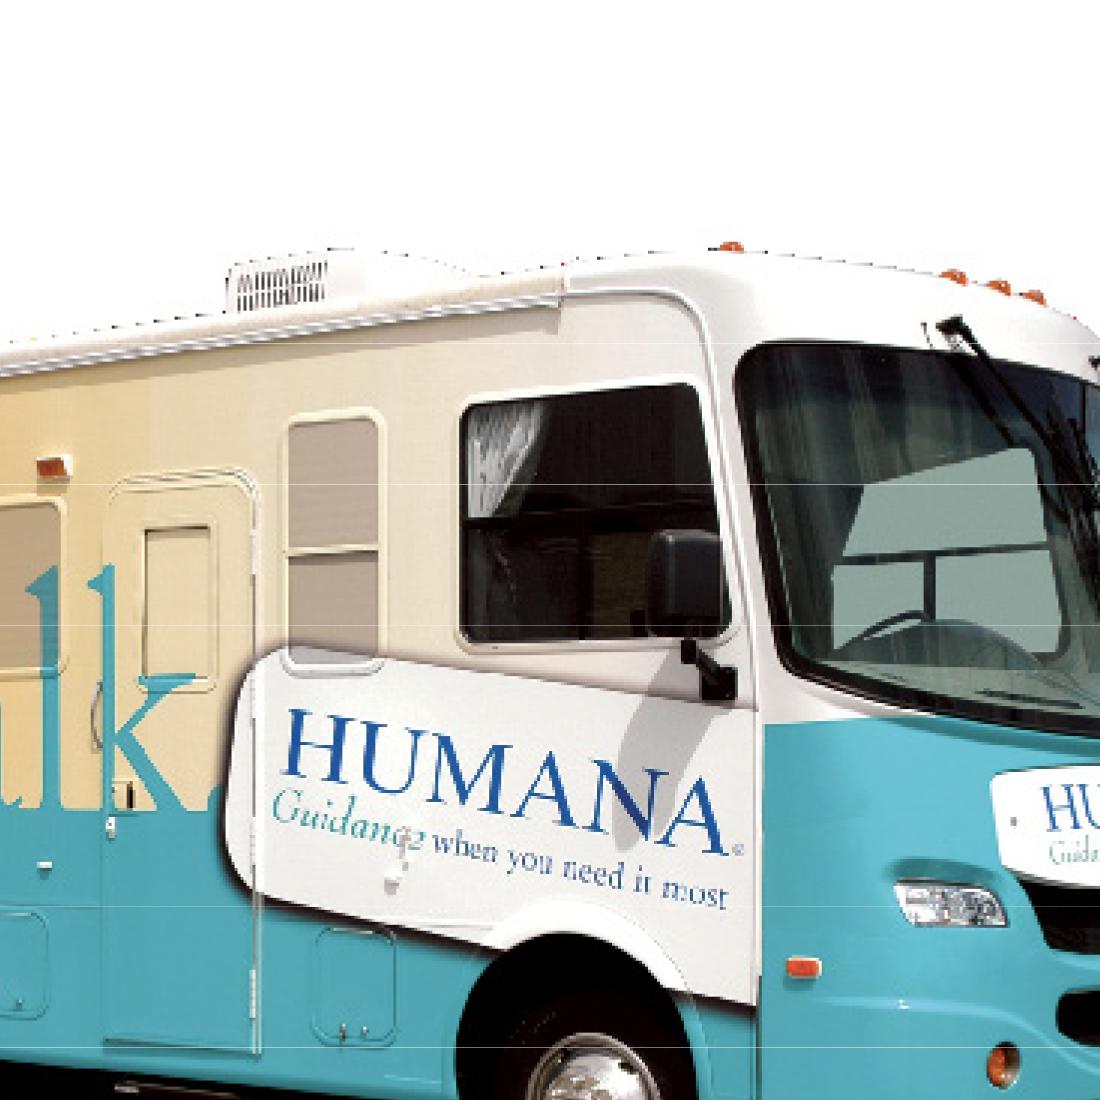 Humana - Design